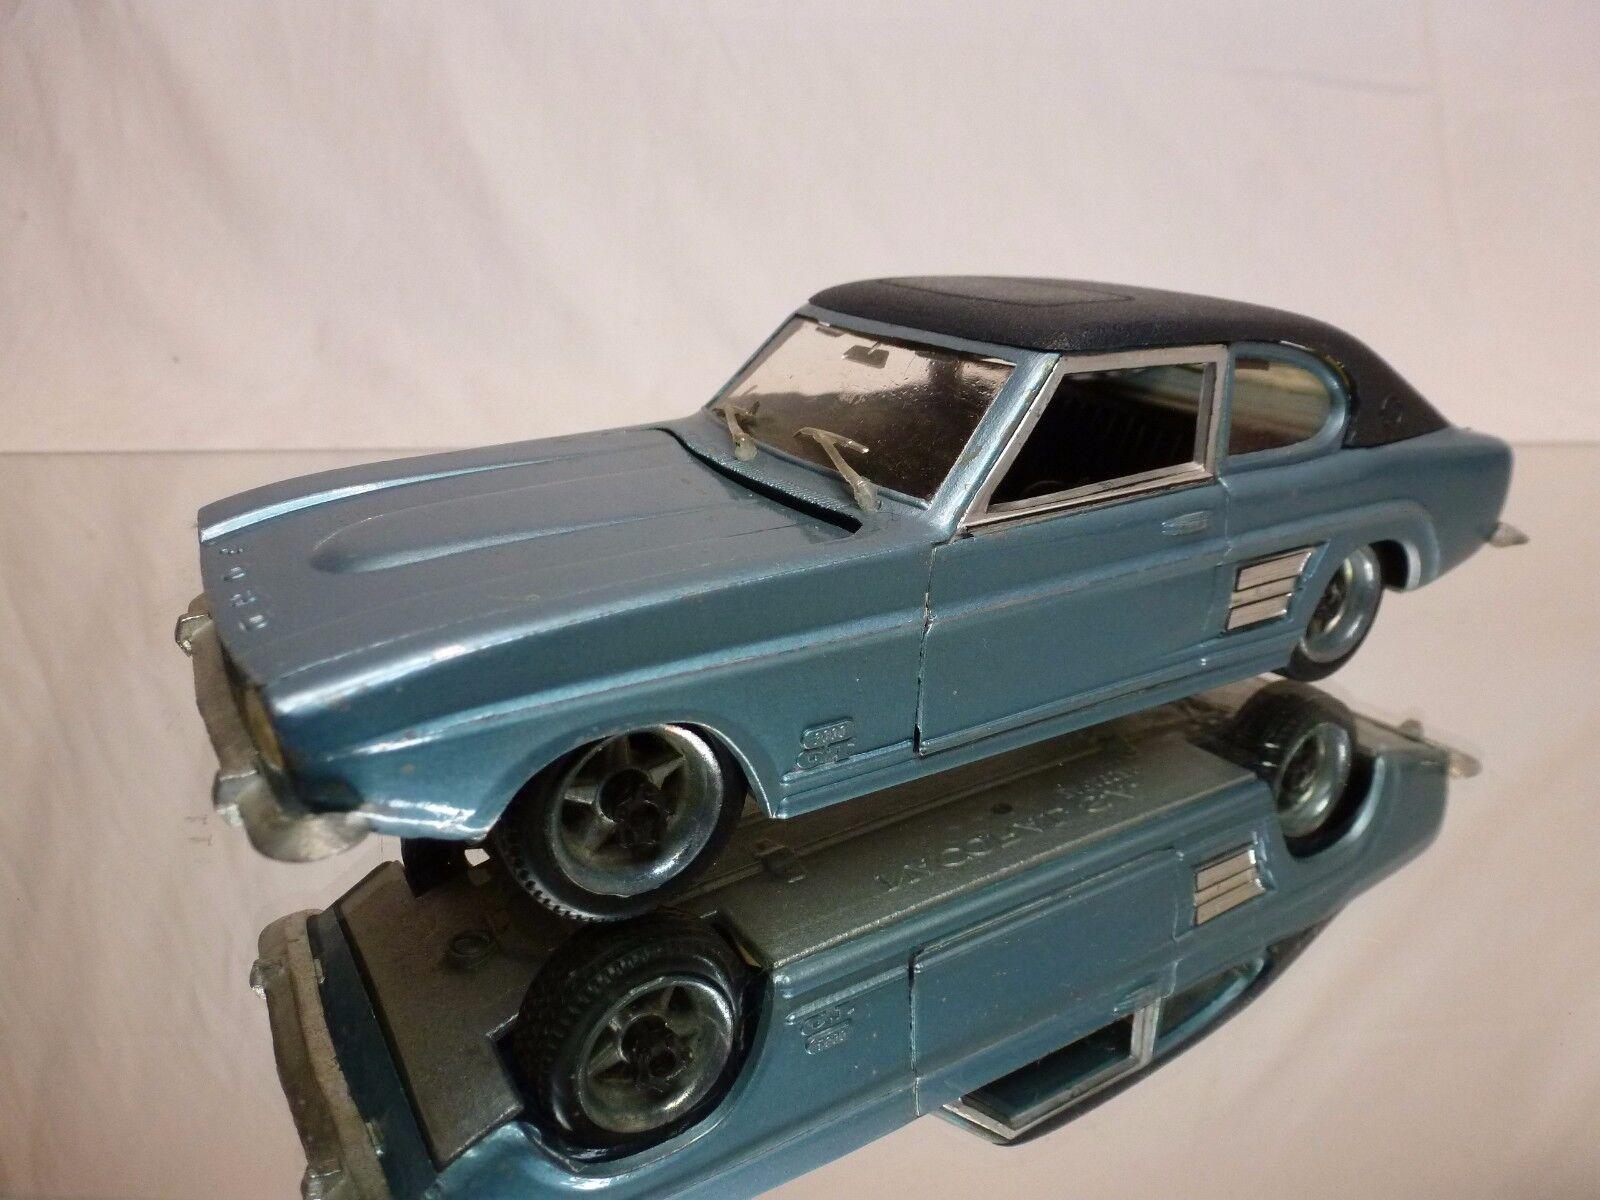 NACORAL FORD CAPRI 2600 GT -  METALLIC bleu 1 25 - GOOD CONDITION  assurance qualité